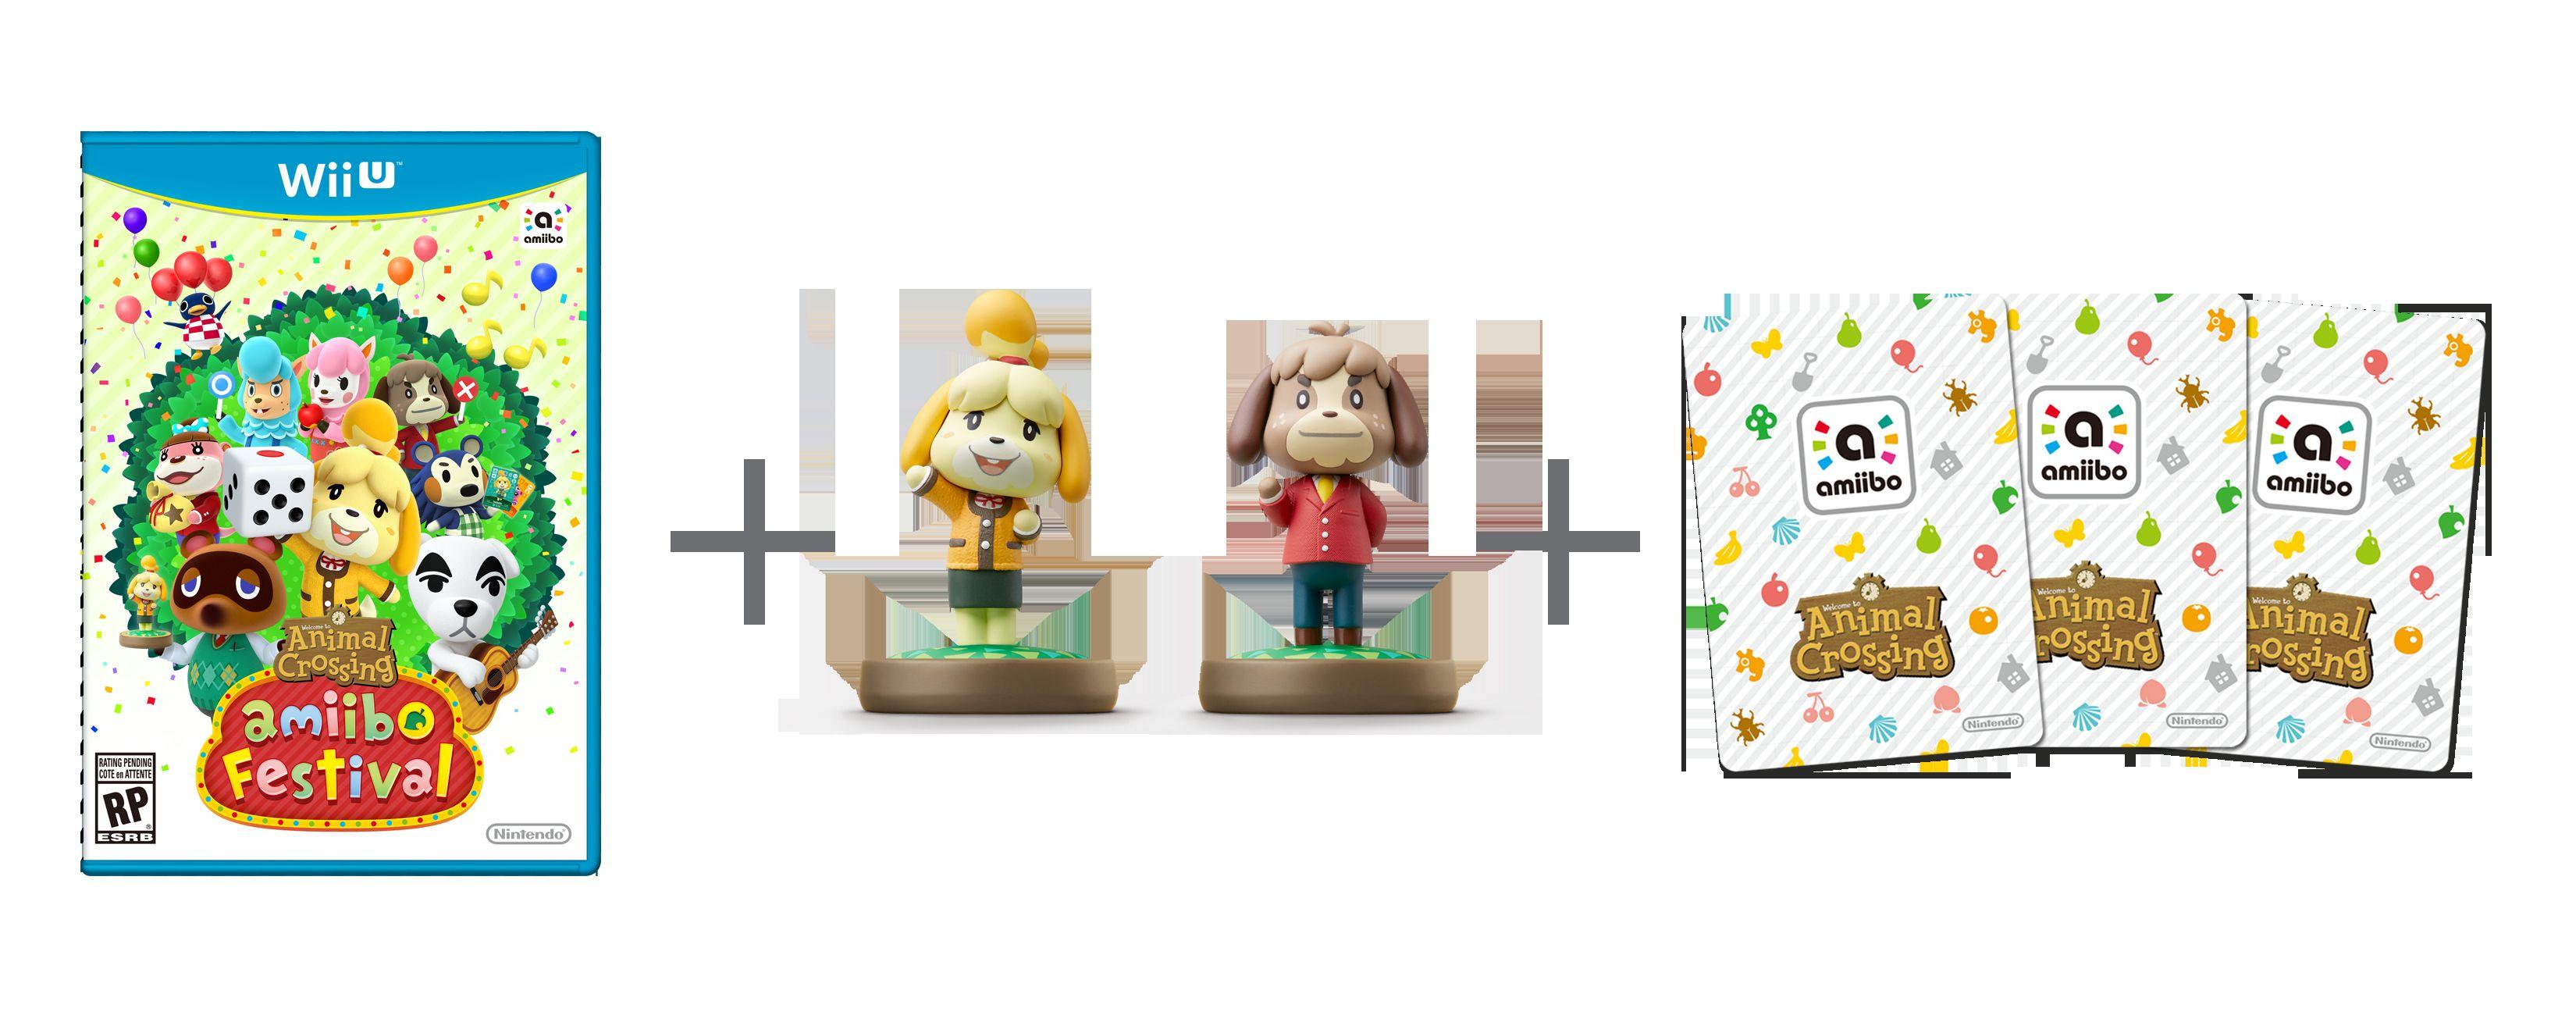 Animal crossing happy home designer japanese overview - Animal crossing happy home designer bundle ...